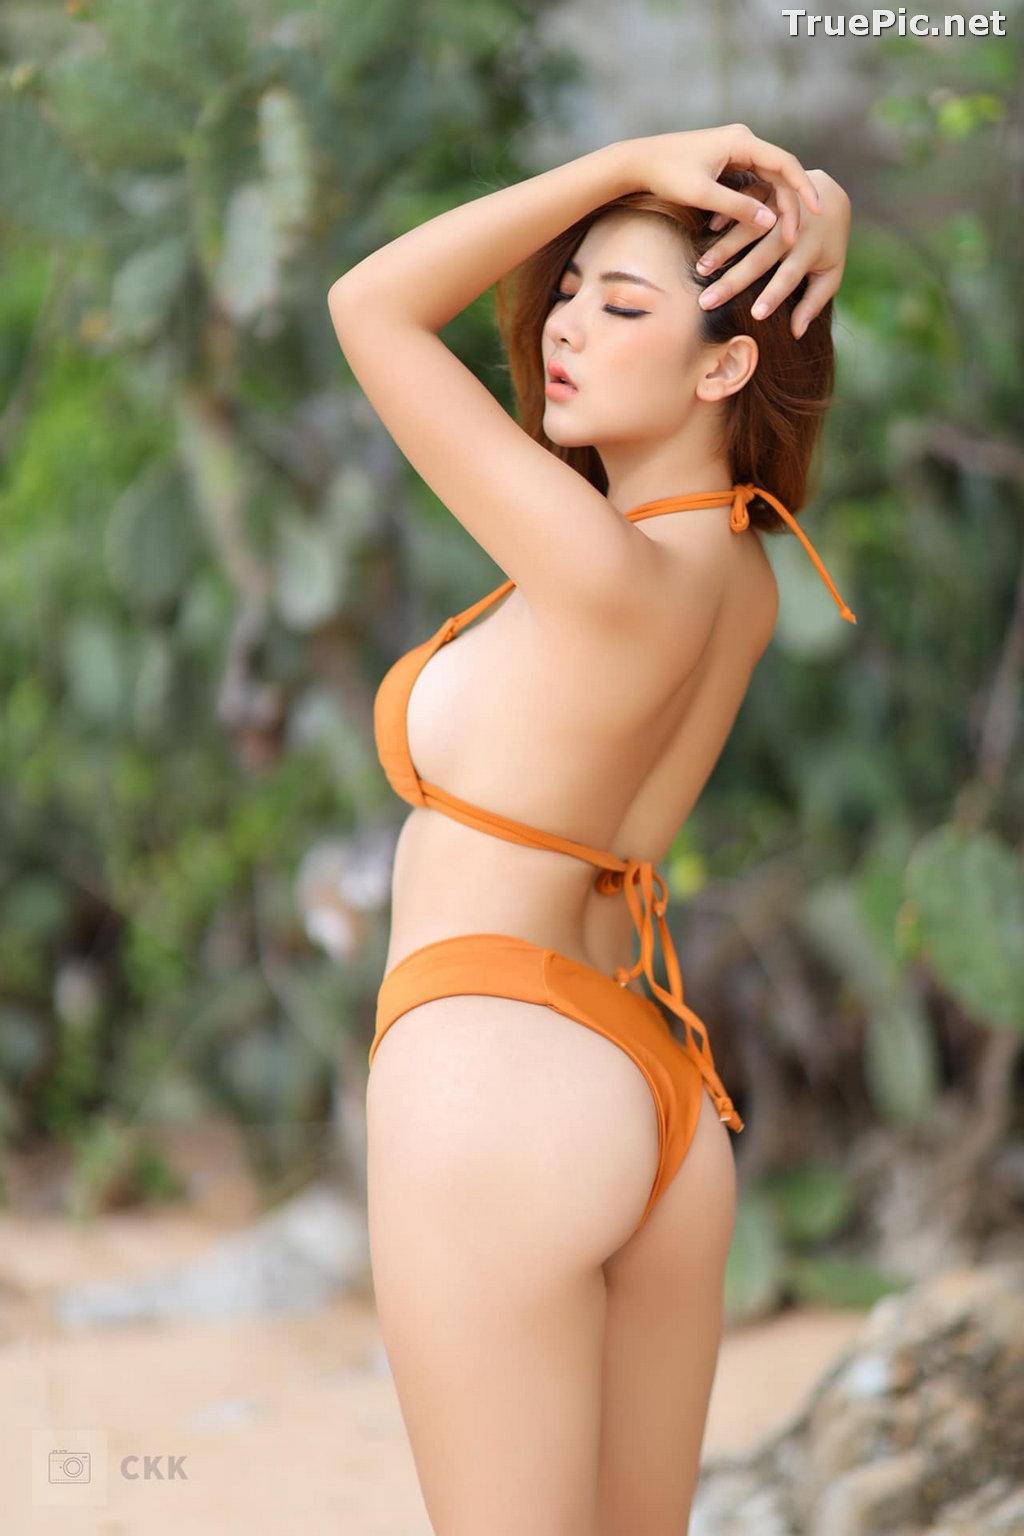 Image Thailand Model - Montakan Kaengraeng - Sexy Orange Bikini - TruePic.net - Picture-9